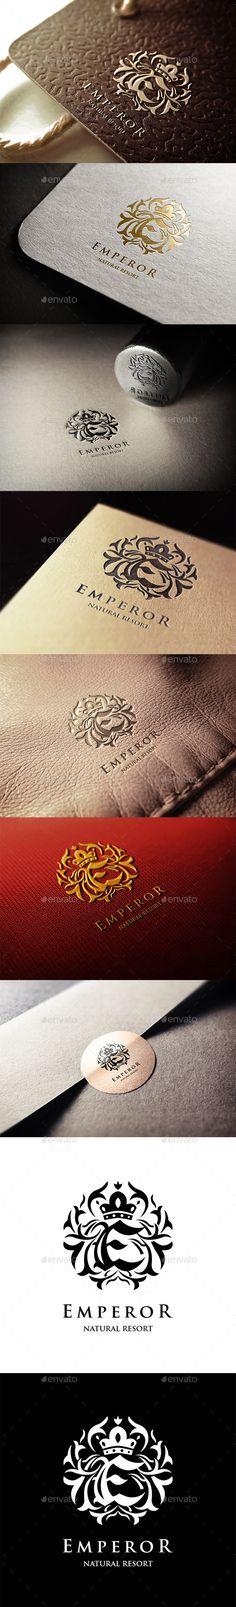 Emperor Resort Logo — Vector EPS #royal #kings • Available here → https://graphicriver.net/item/emperor-resort-logo/11281945?ref=pxcr